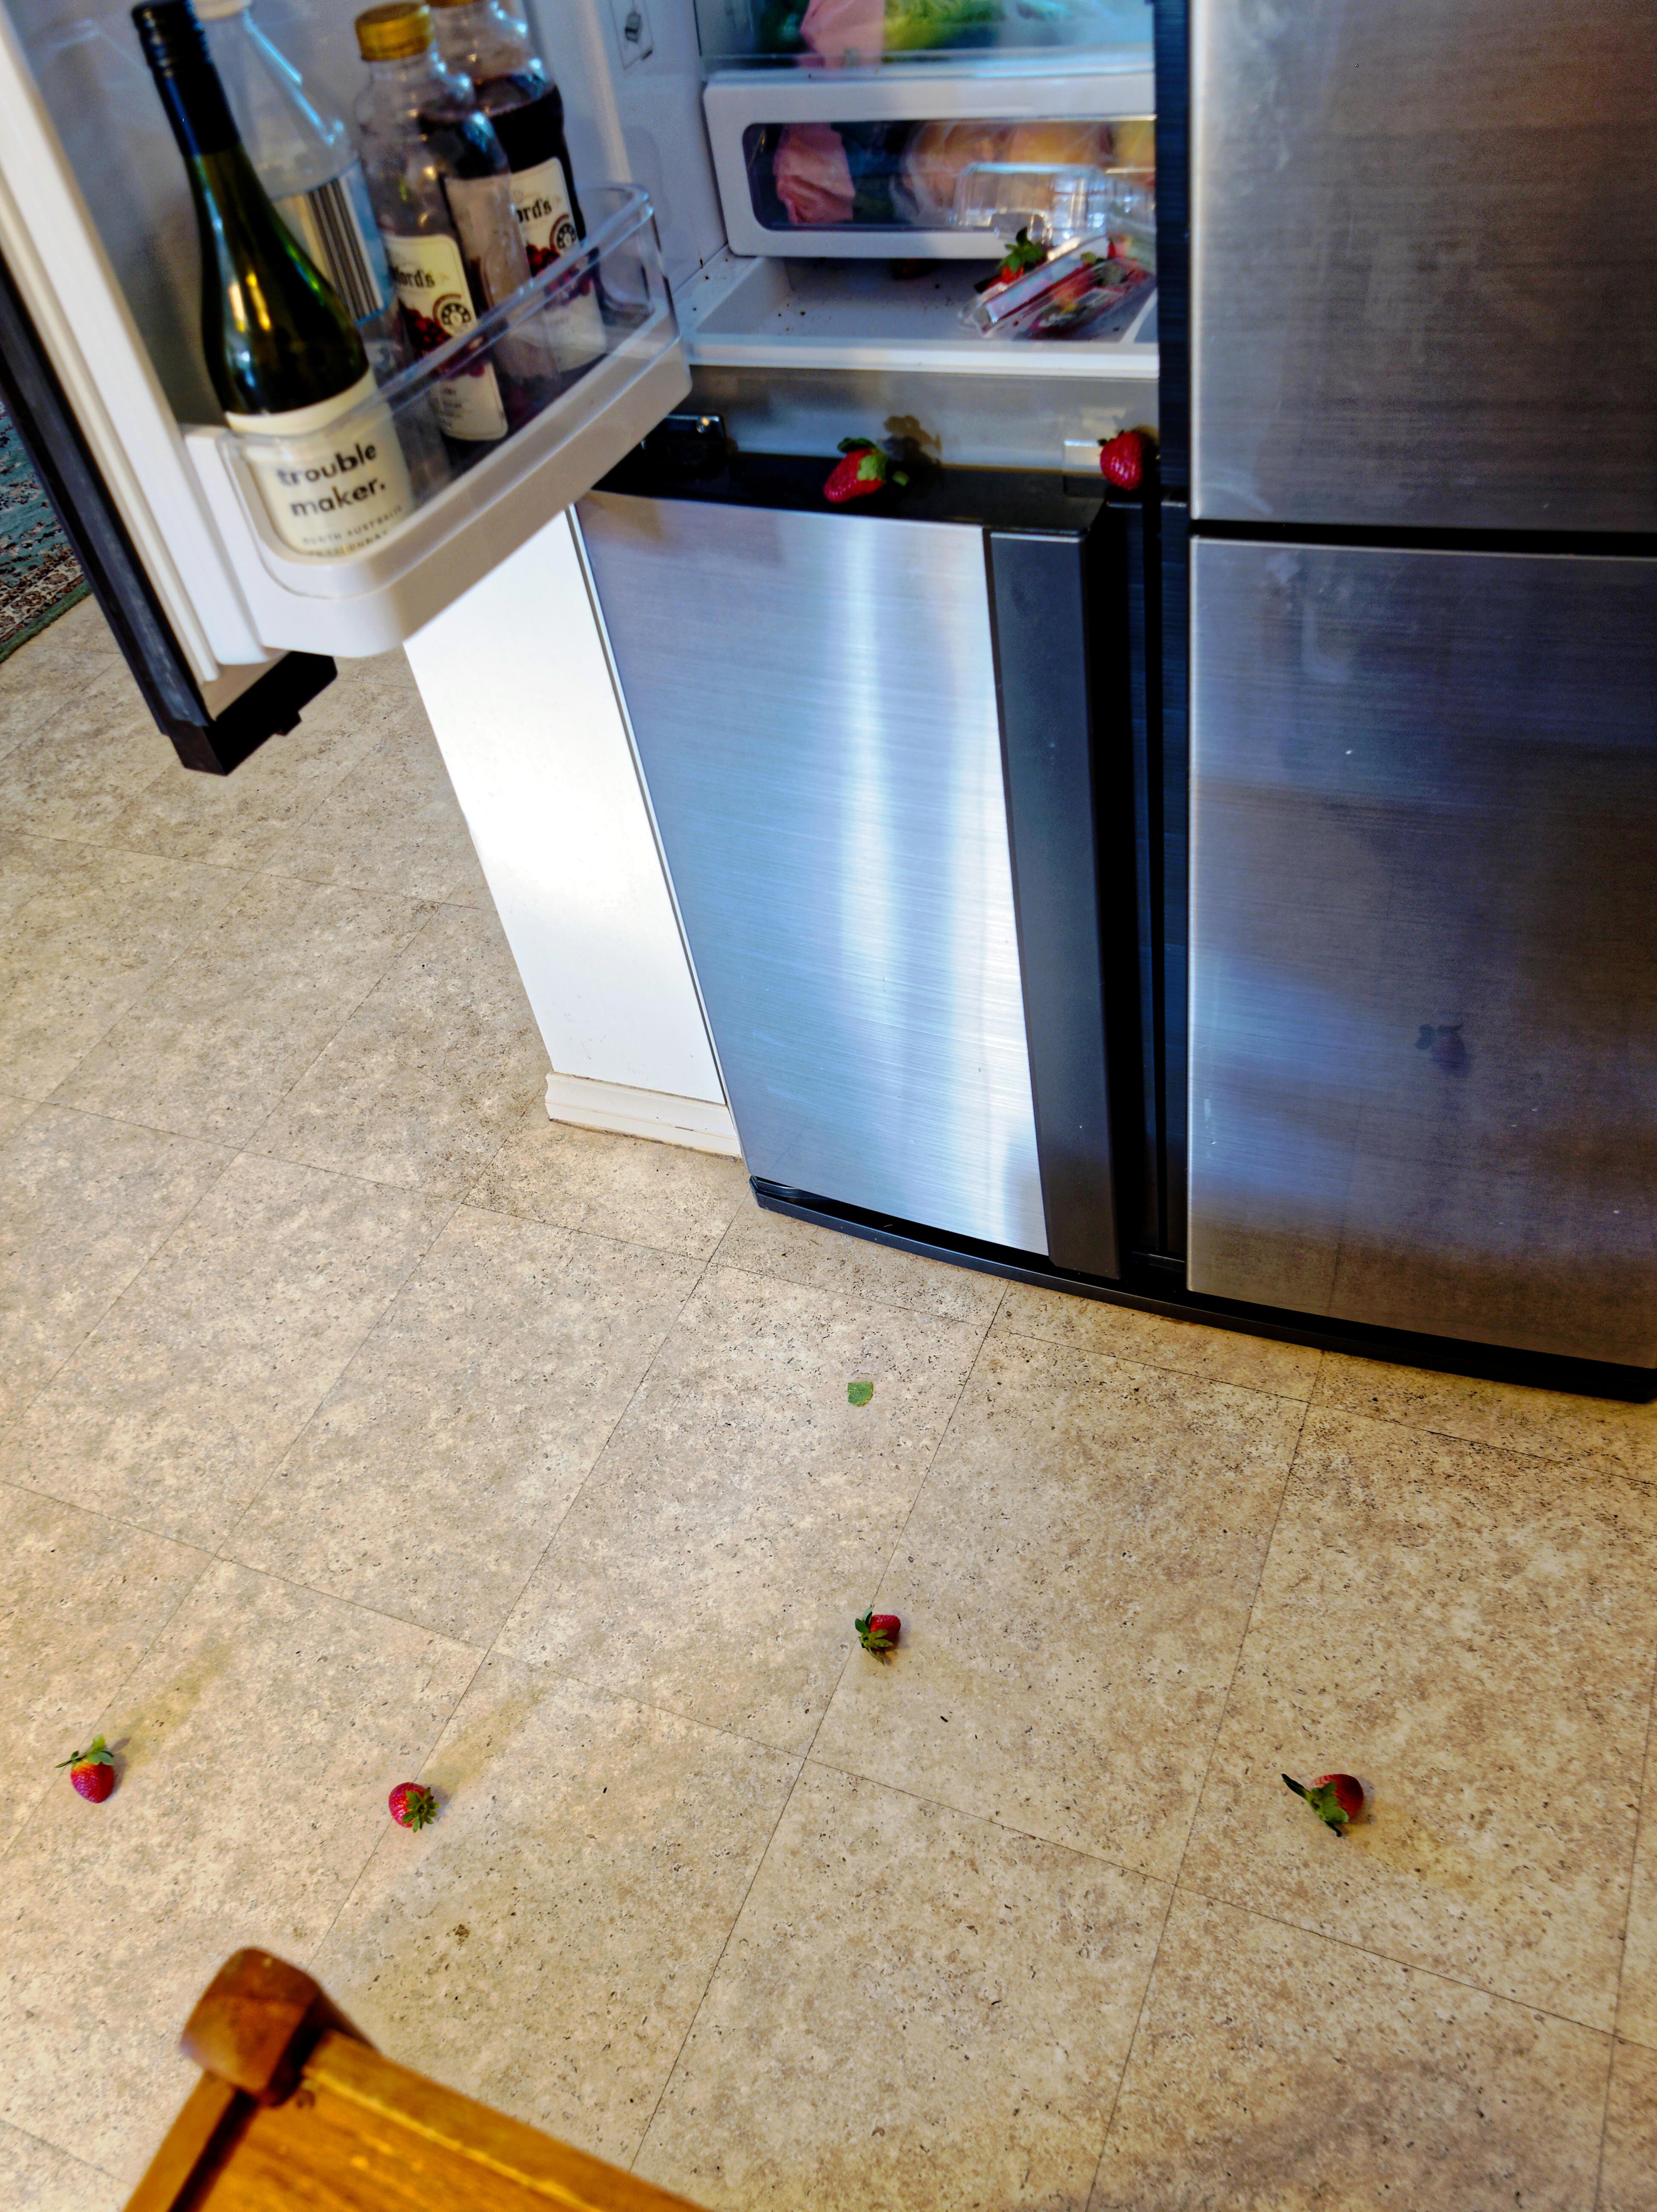 Strawberry-attack-1.jpeg